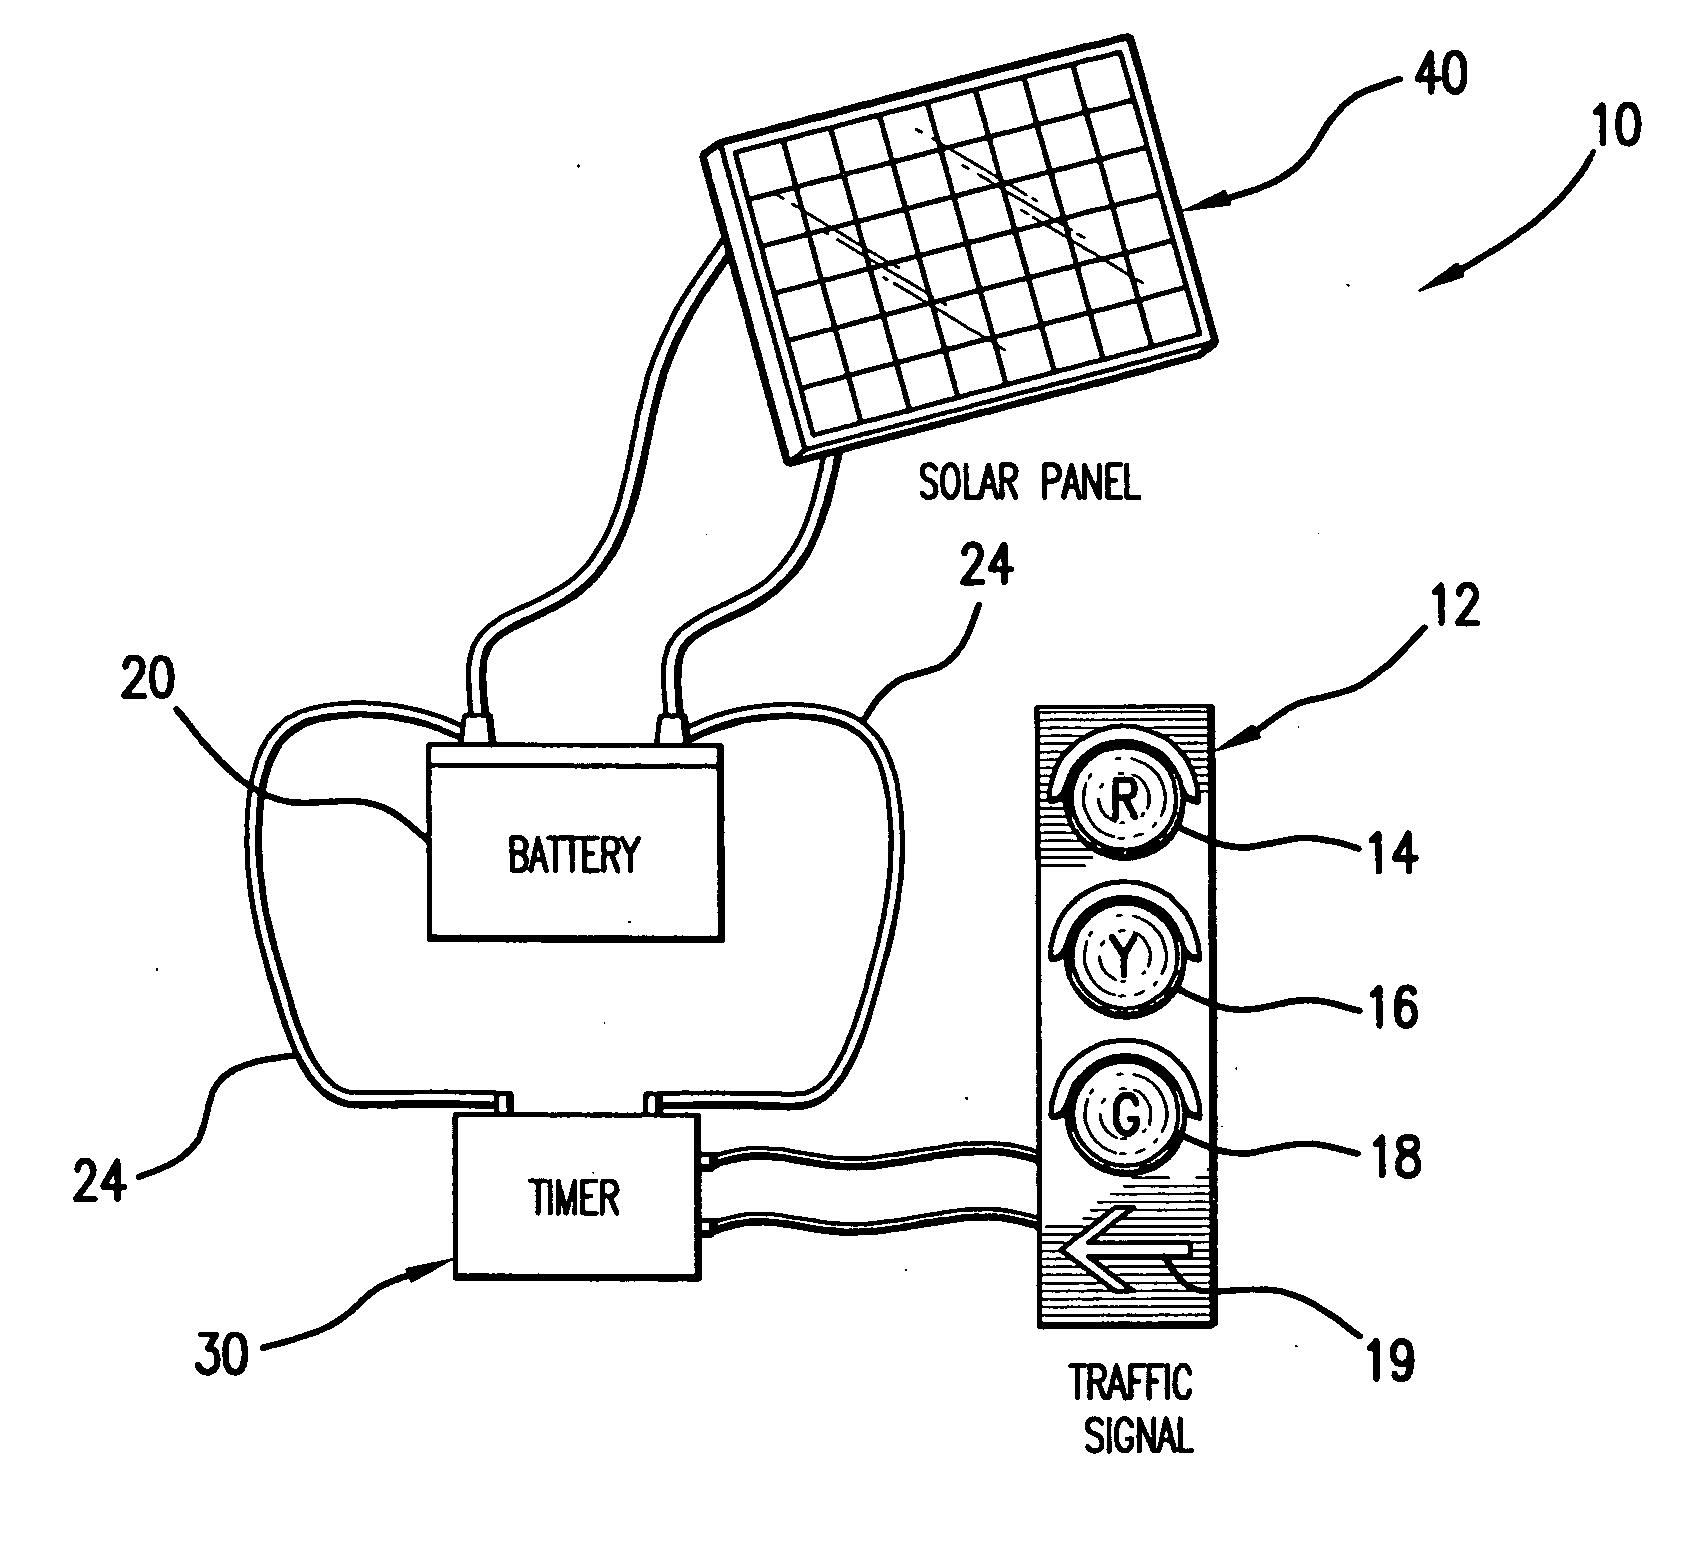 patent us20070126599 - solar power traffic light